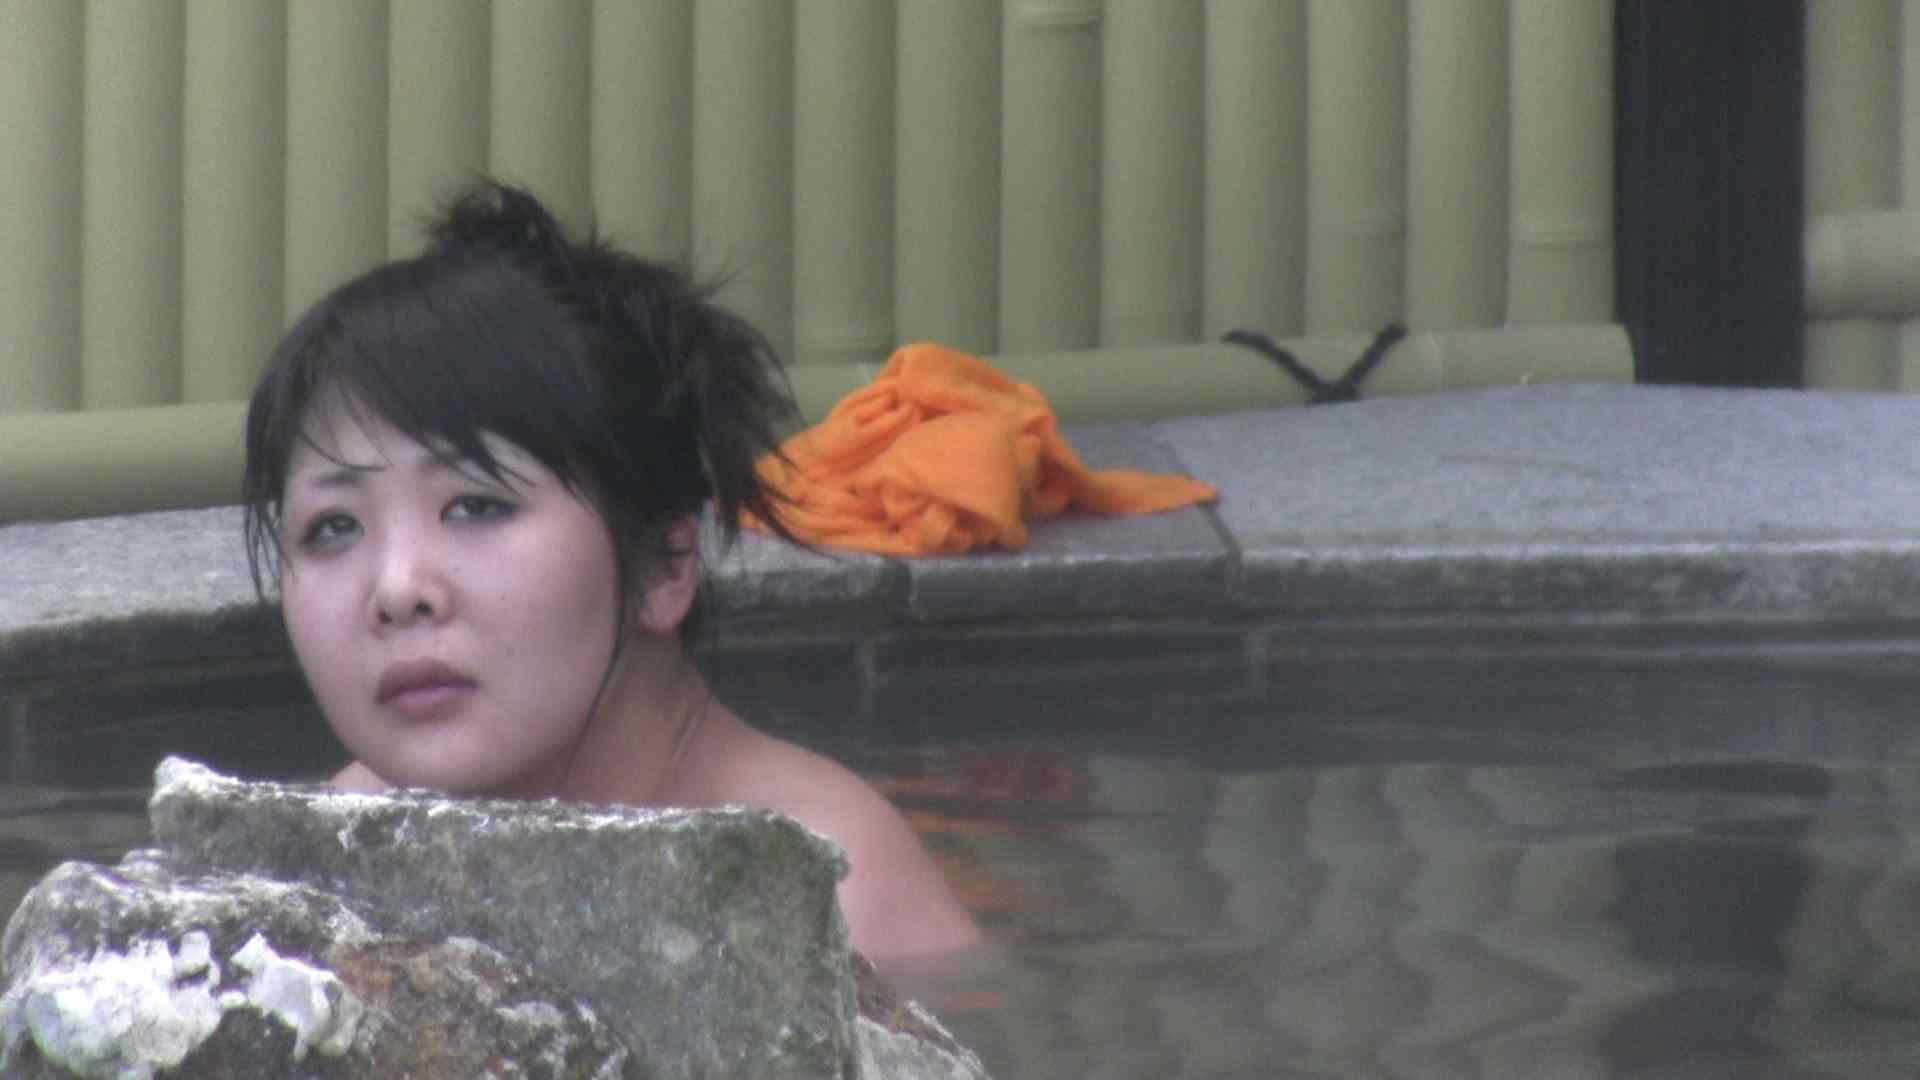 Aquaな露天風呂Vol.118 OL女体  68連発 42